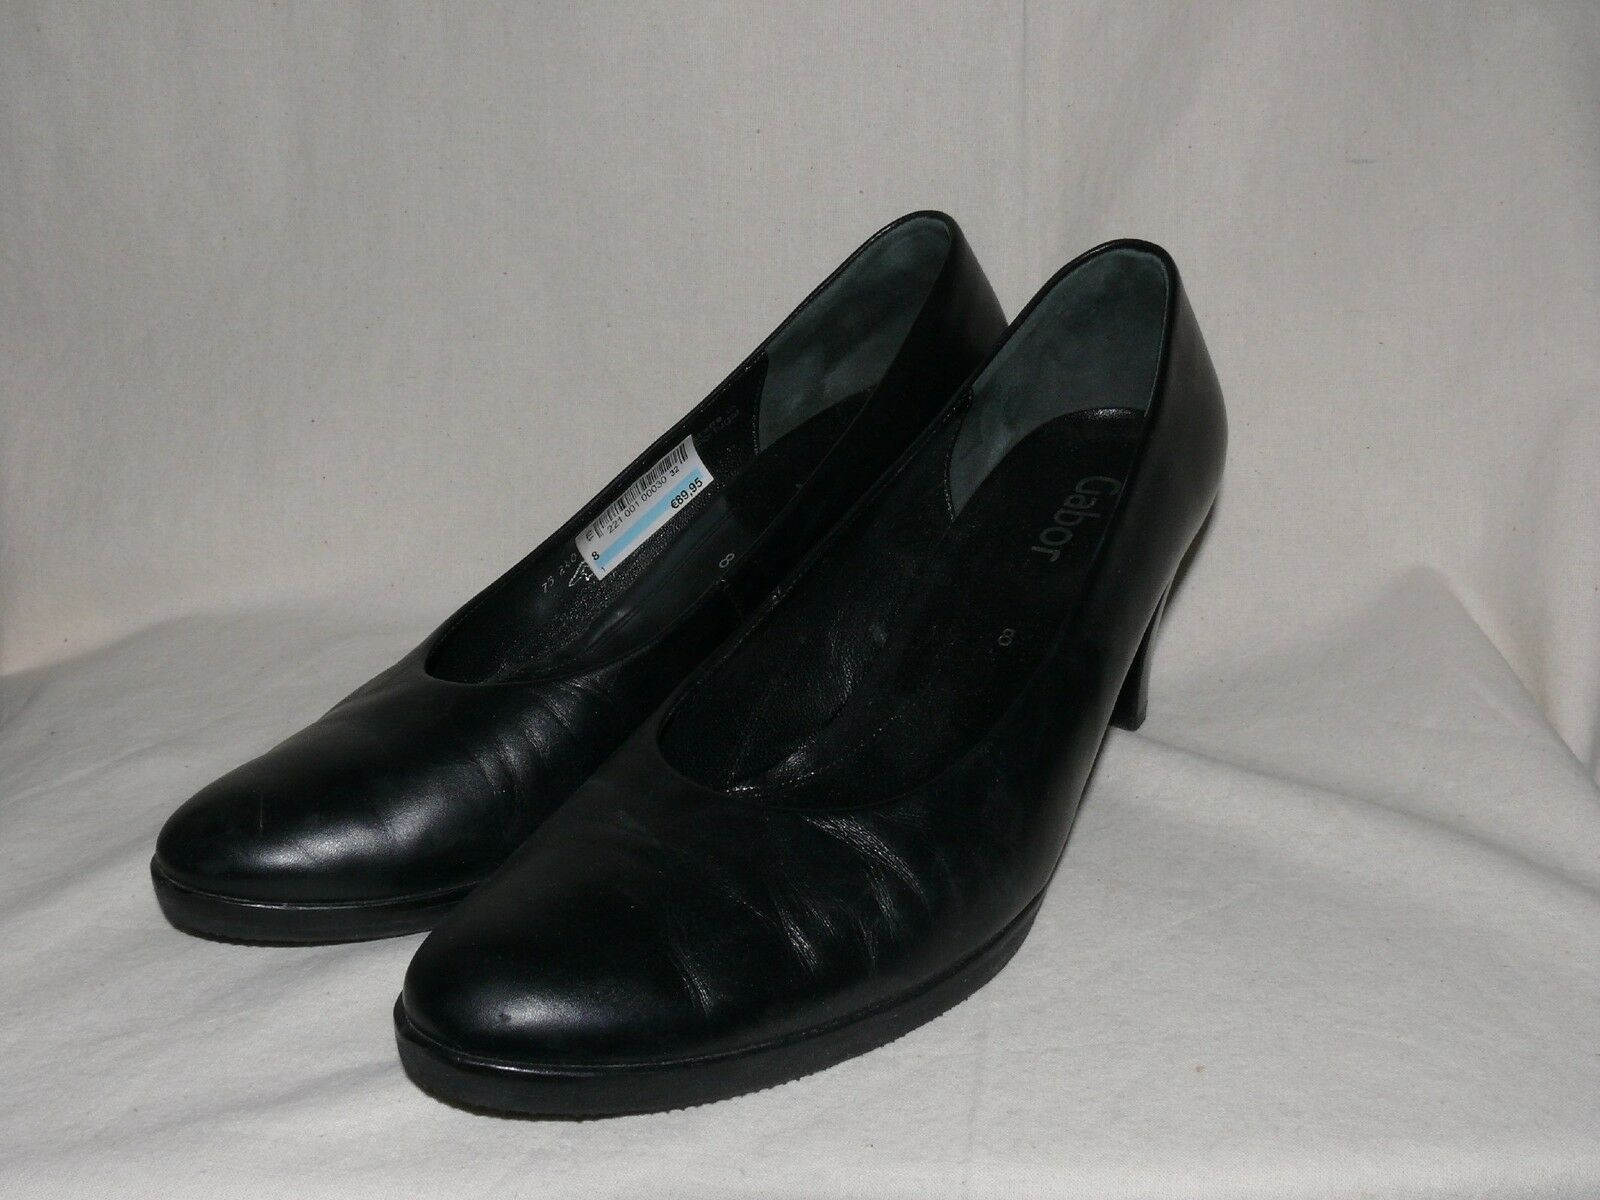 Gabor Clásico Cuero Bombas Zapatos Negro de Noche Negro Zapatos Talla 8 como Nuevo fd1e01